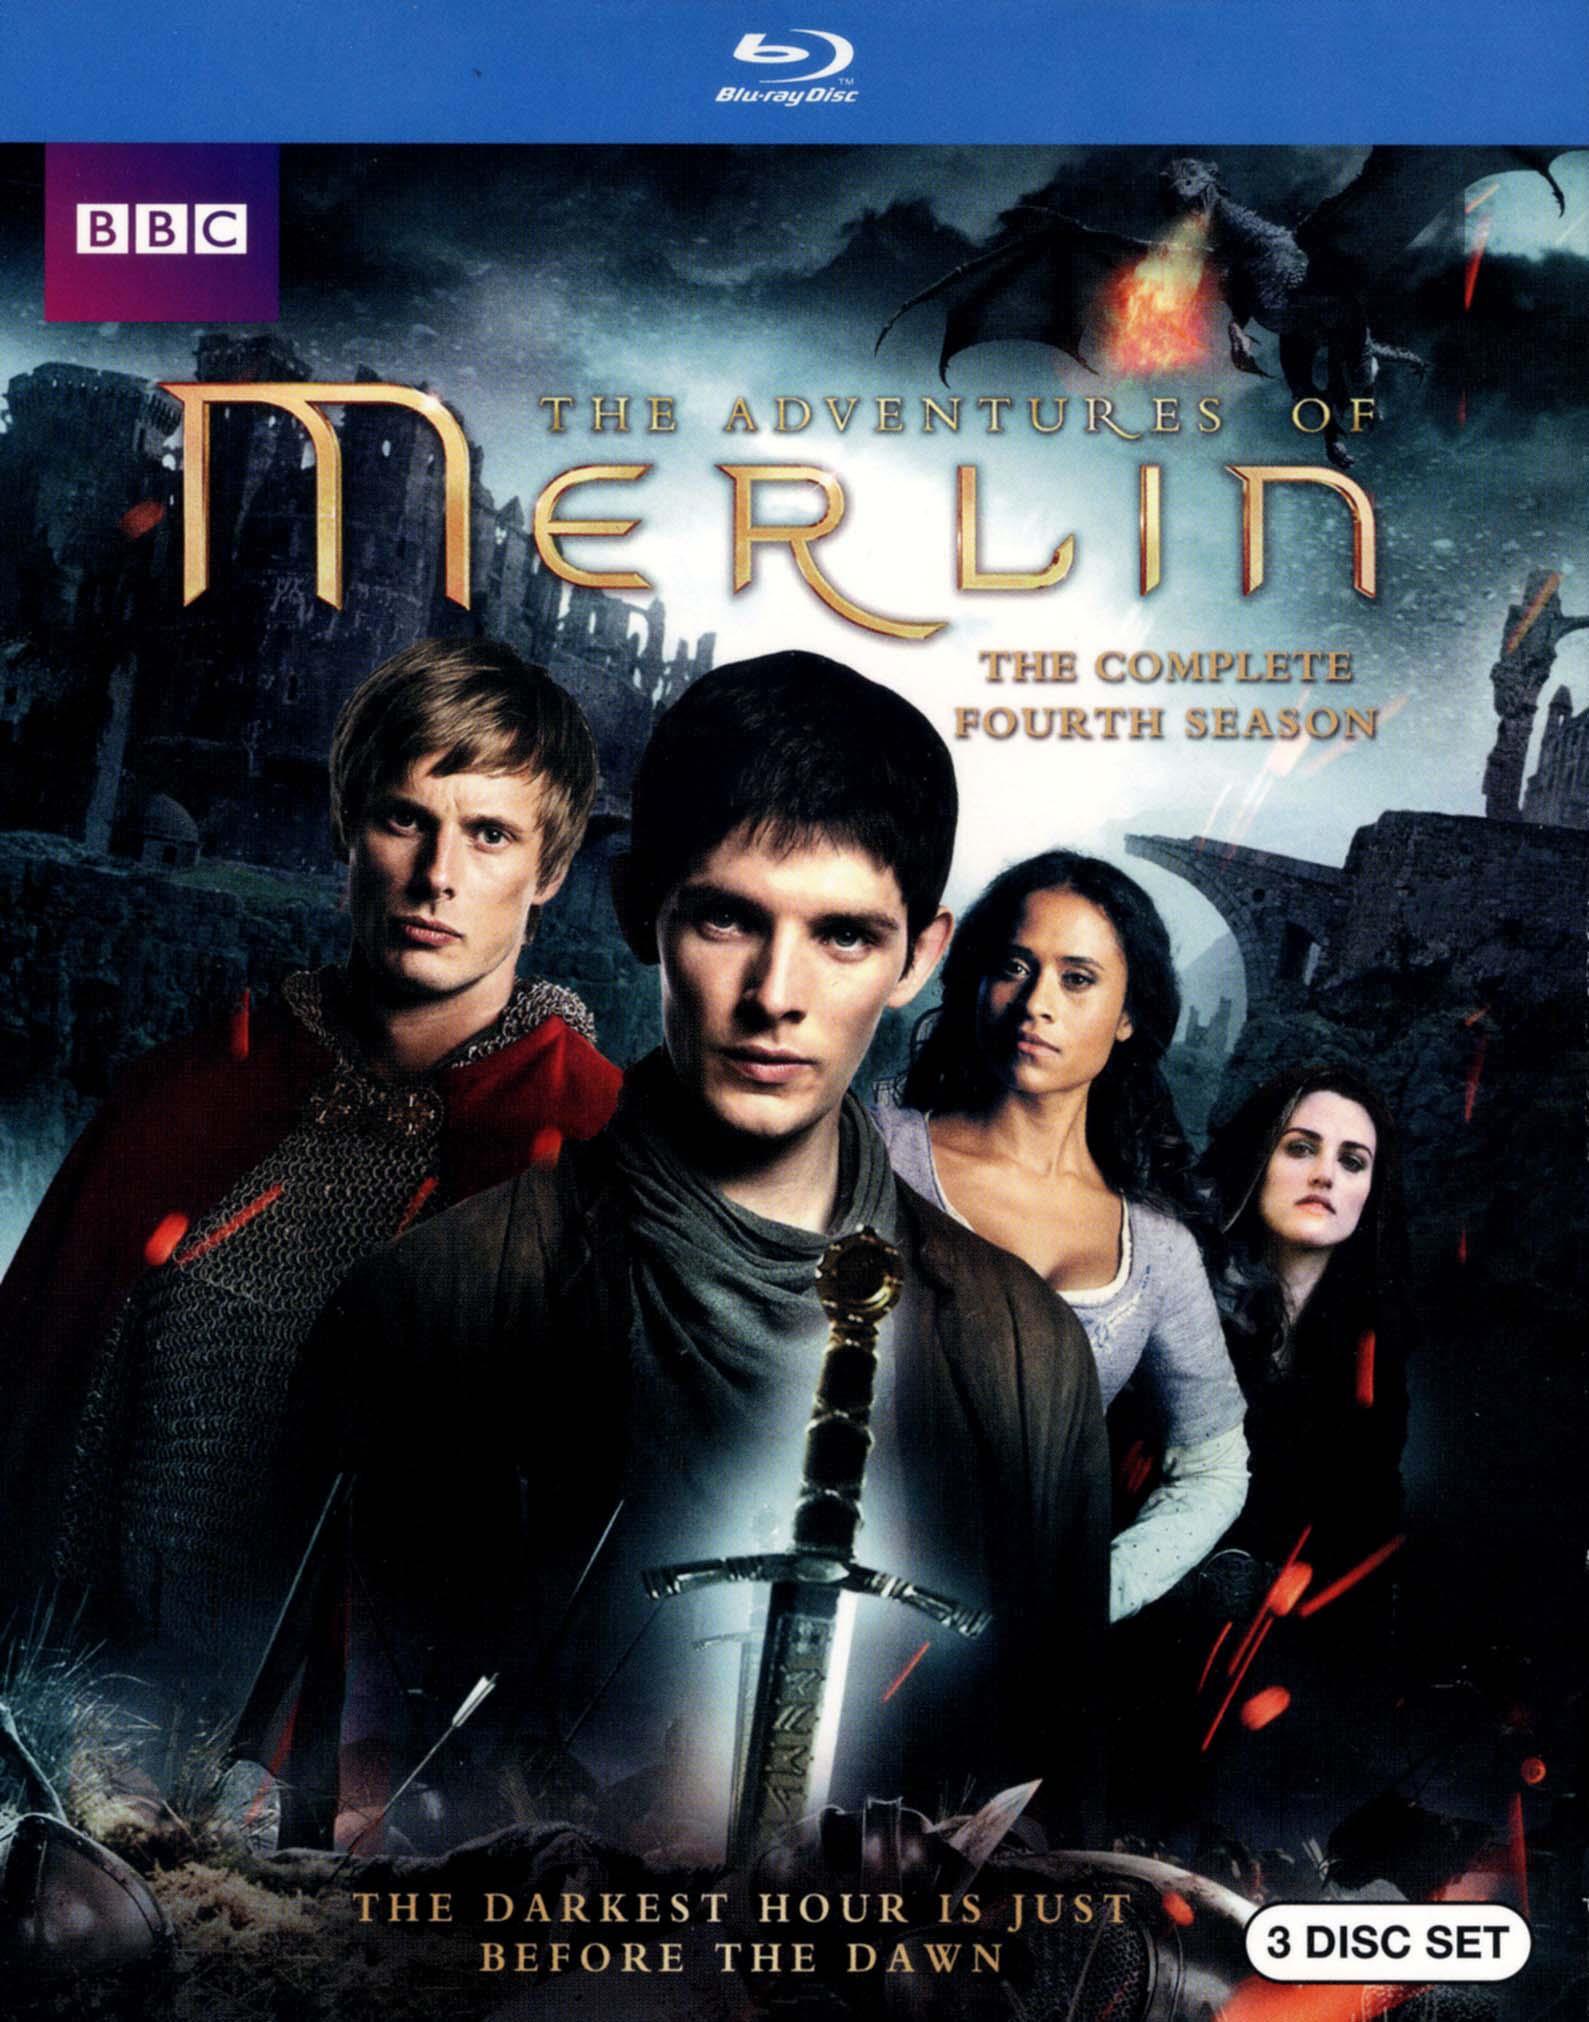 Merlin: The Complete Fourth Season [3 Discs] [blu-ray] 7344375